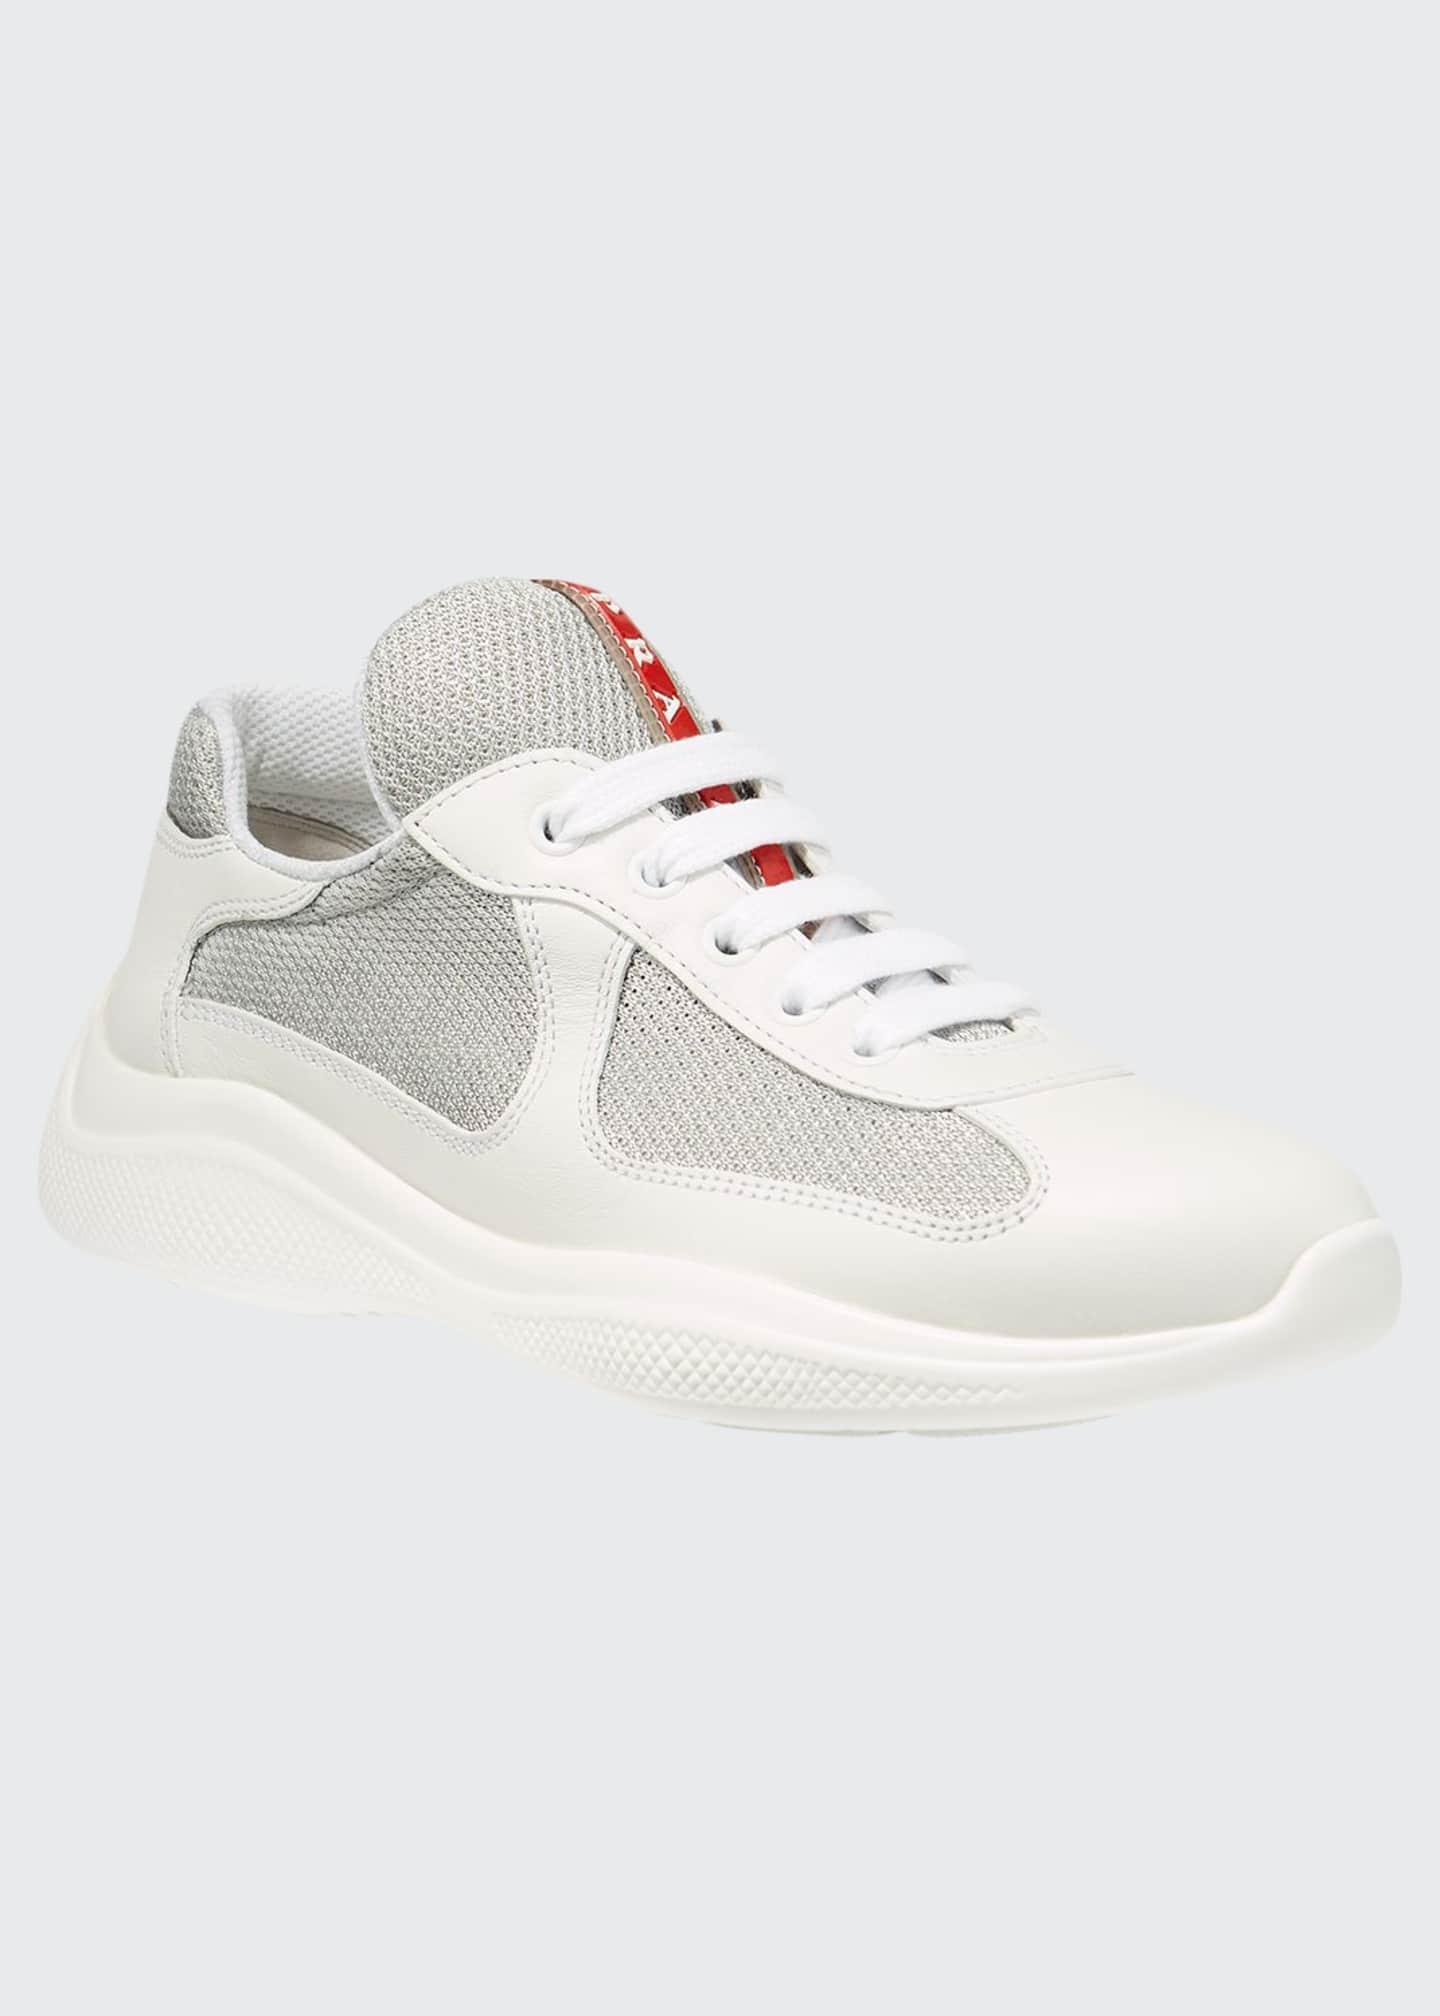 Prada Leather Fabric Sneaker White